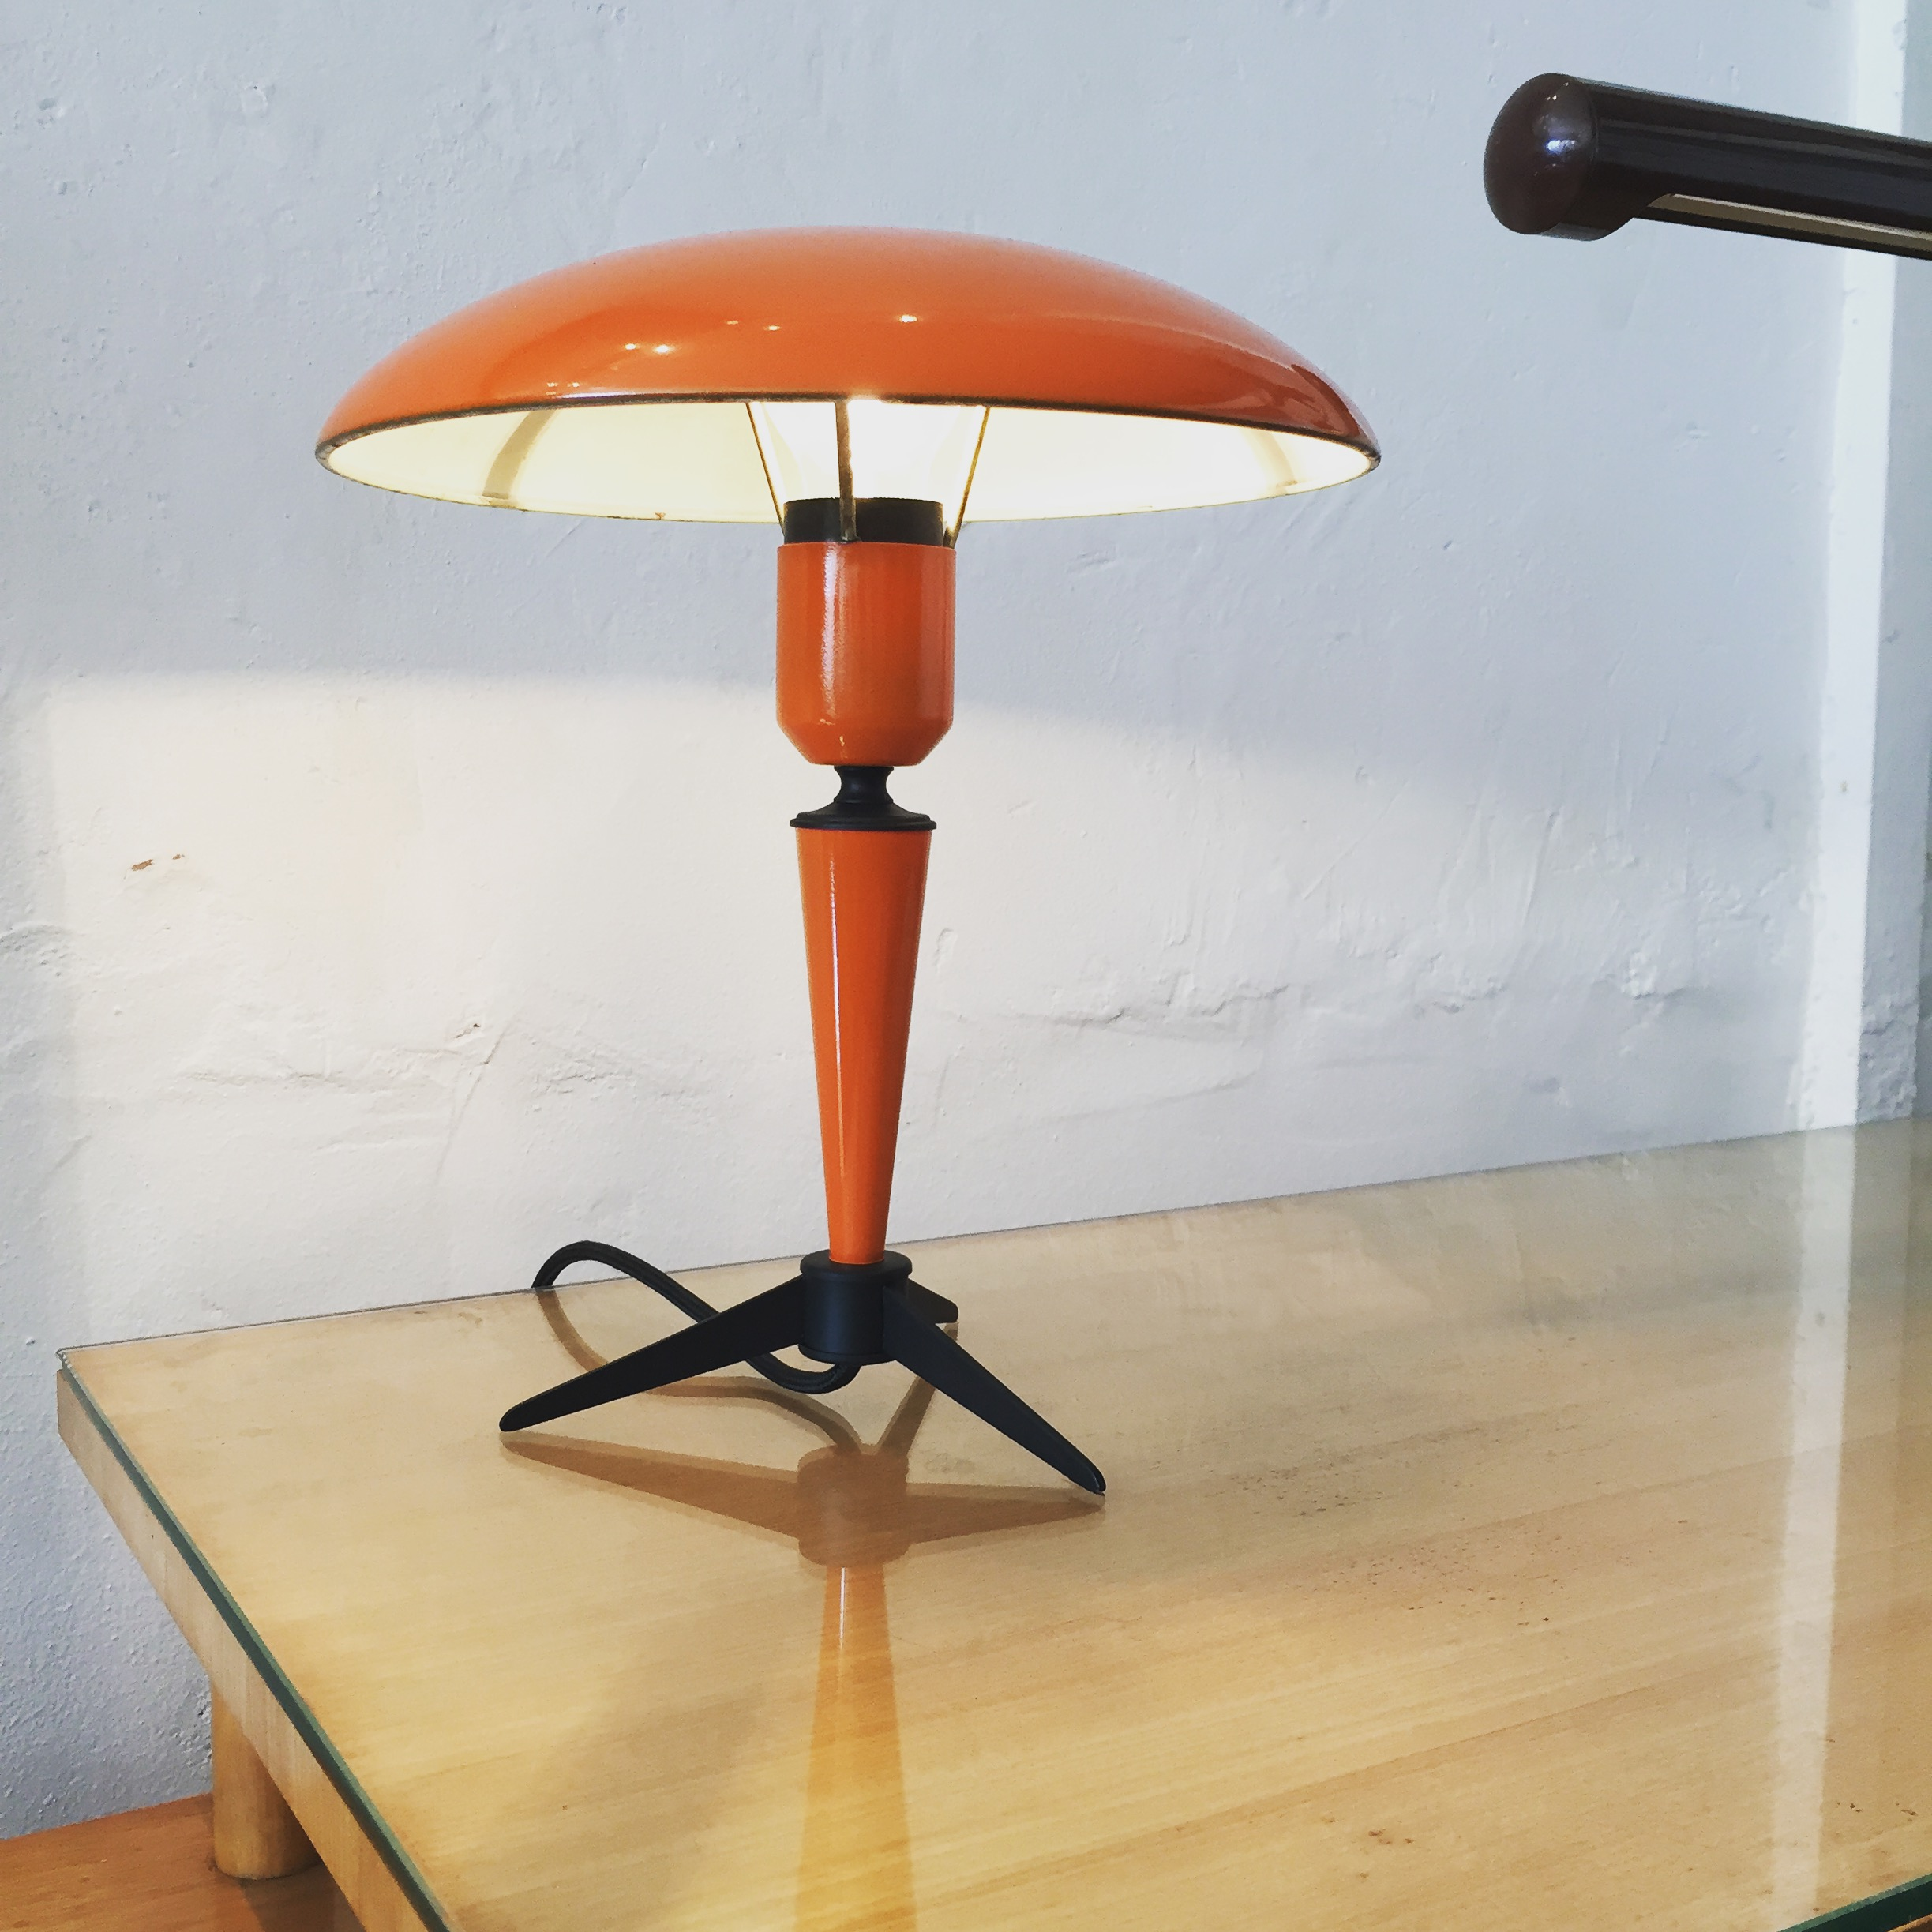 ORANGE TABLE LAMP BY KALFF